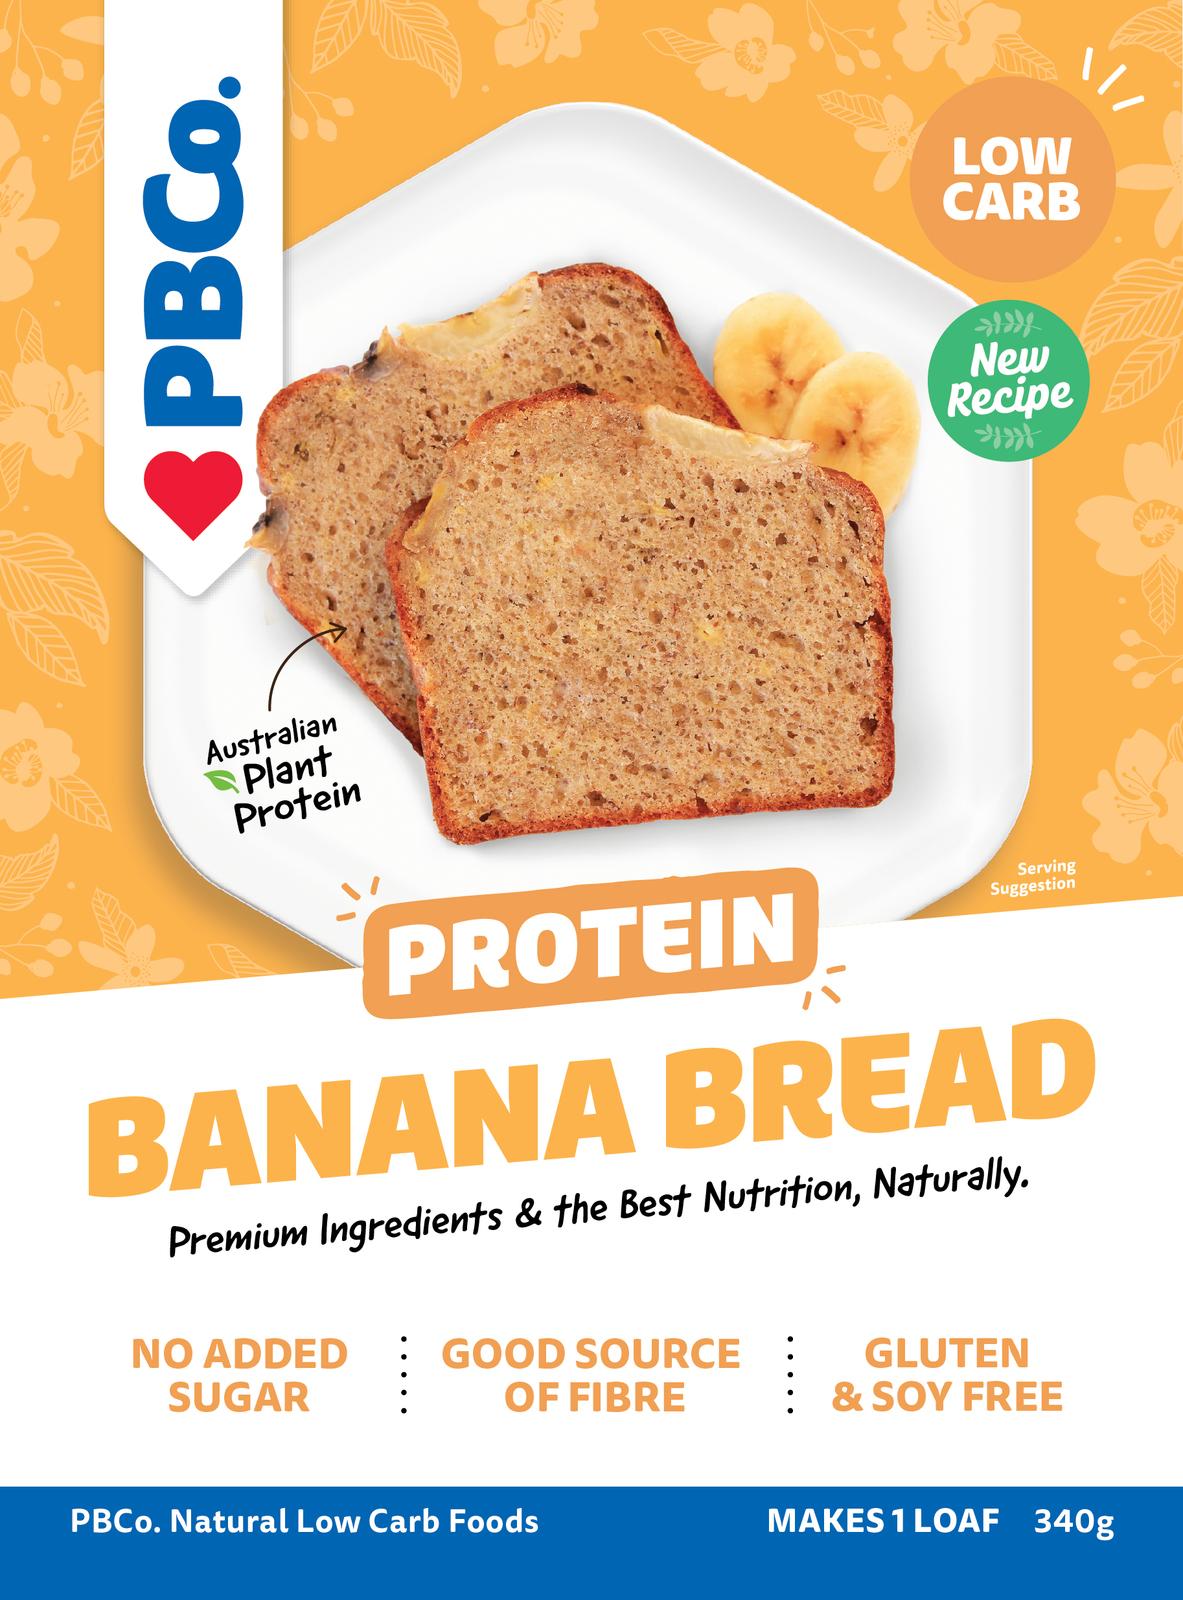 PBCo. Plant Based Protein Banana Bread (340g) image